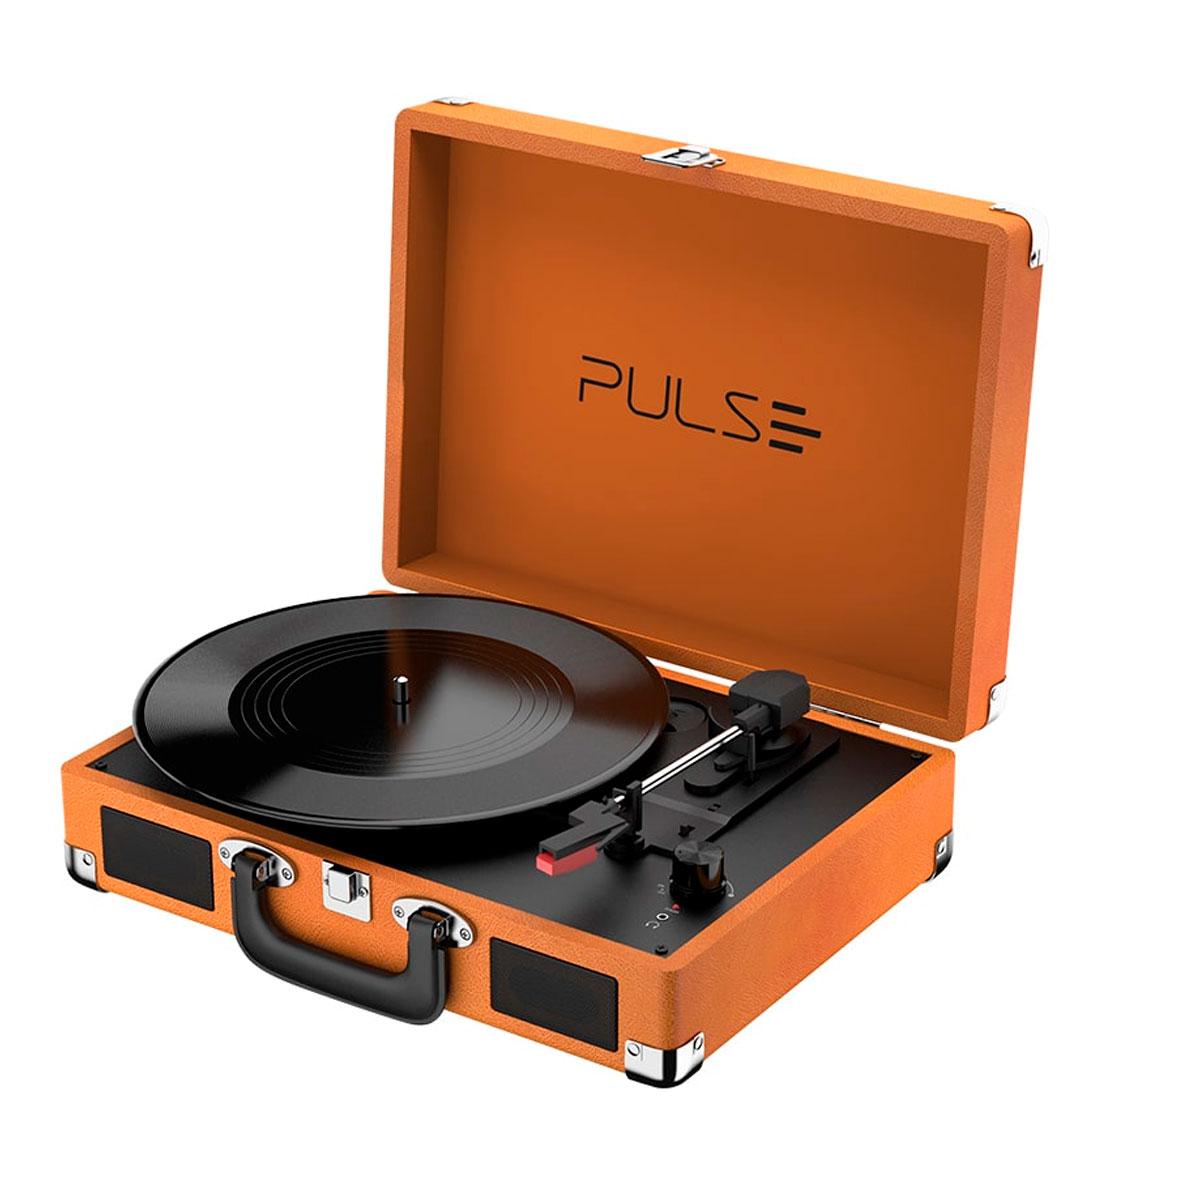 CAIXA DE SOM RETRO PULSE SUITCASE VITROLA 5W BT/AUX/USB SP364  - Audio Video & cia